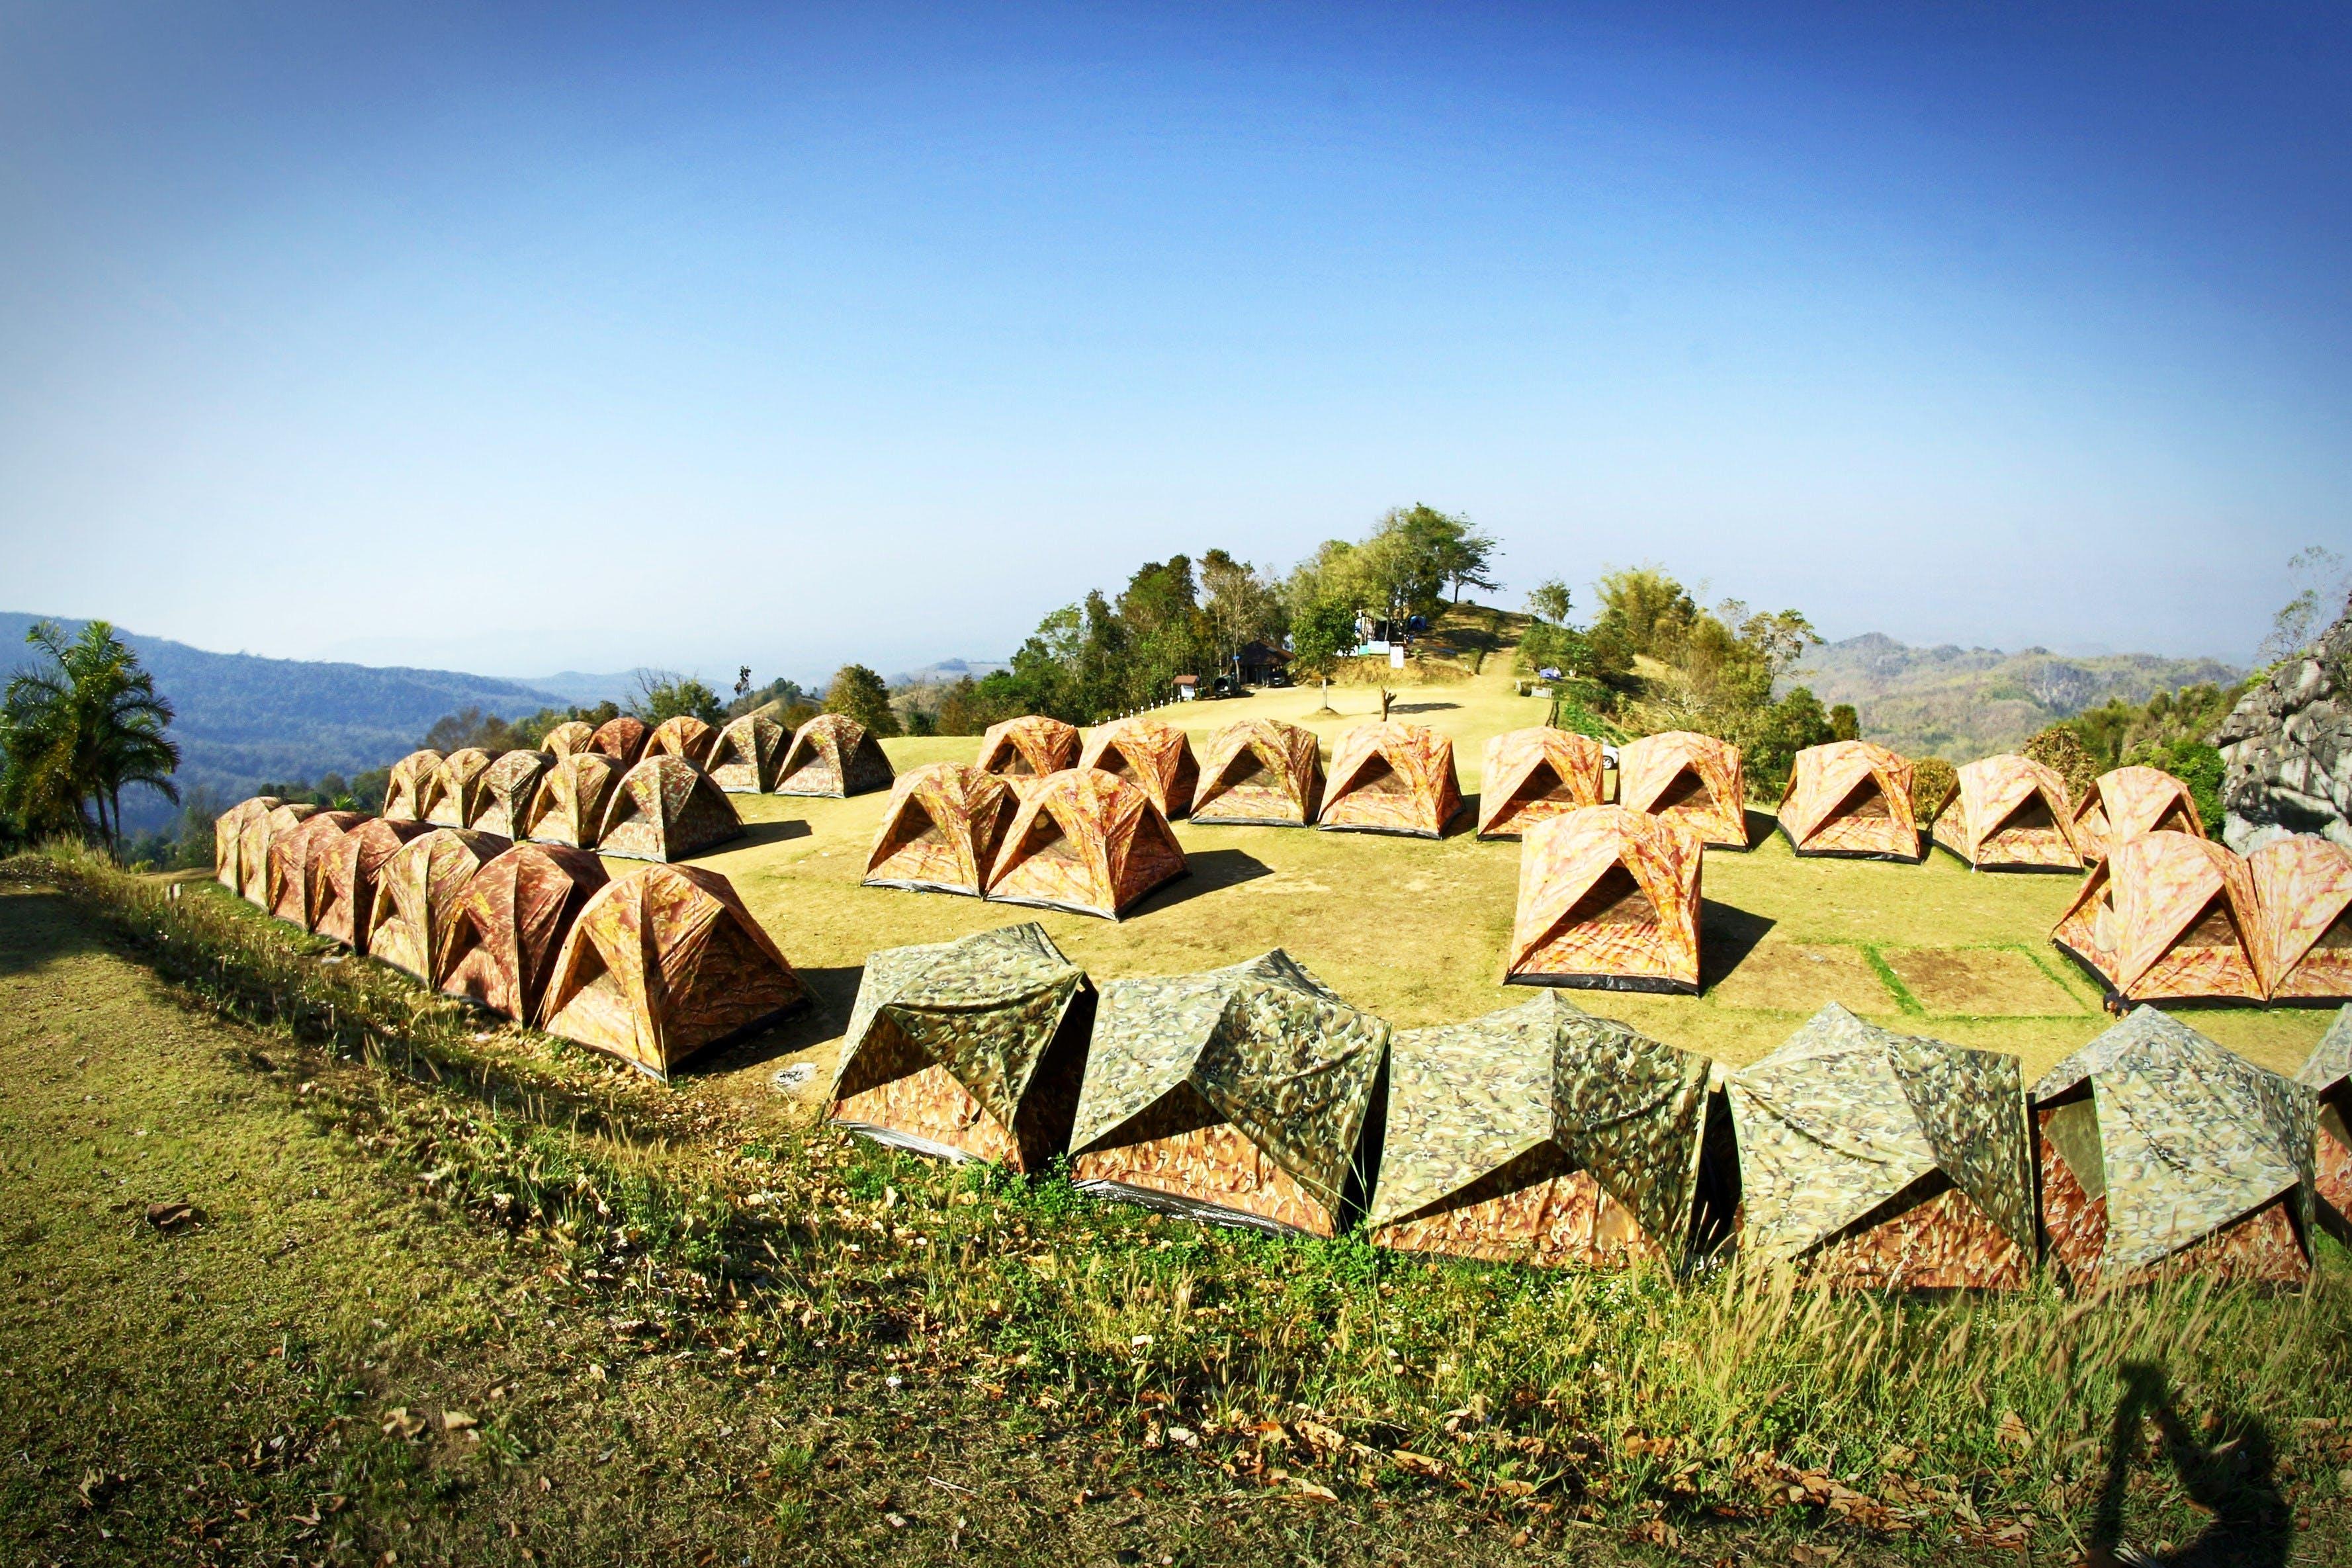 blue sky, camp, camping